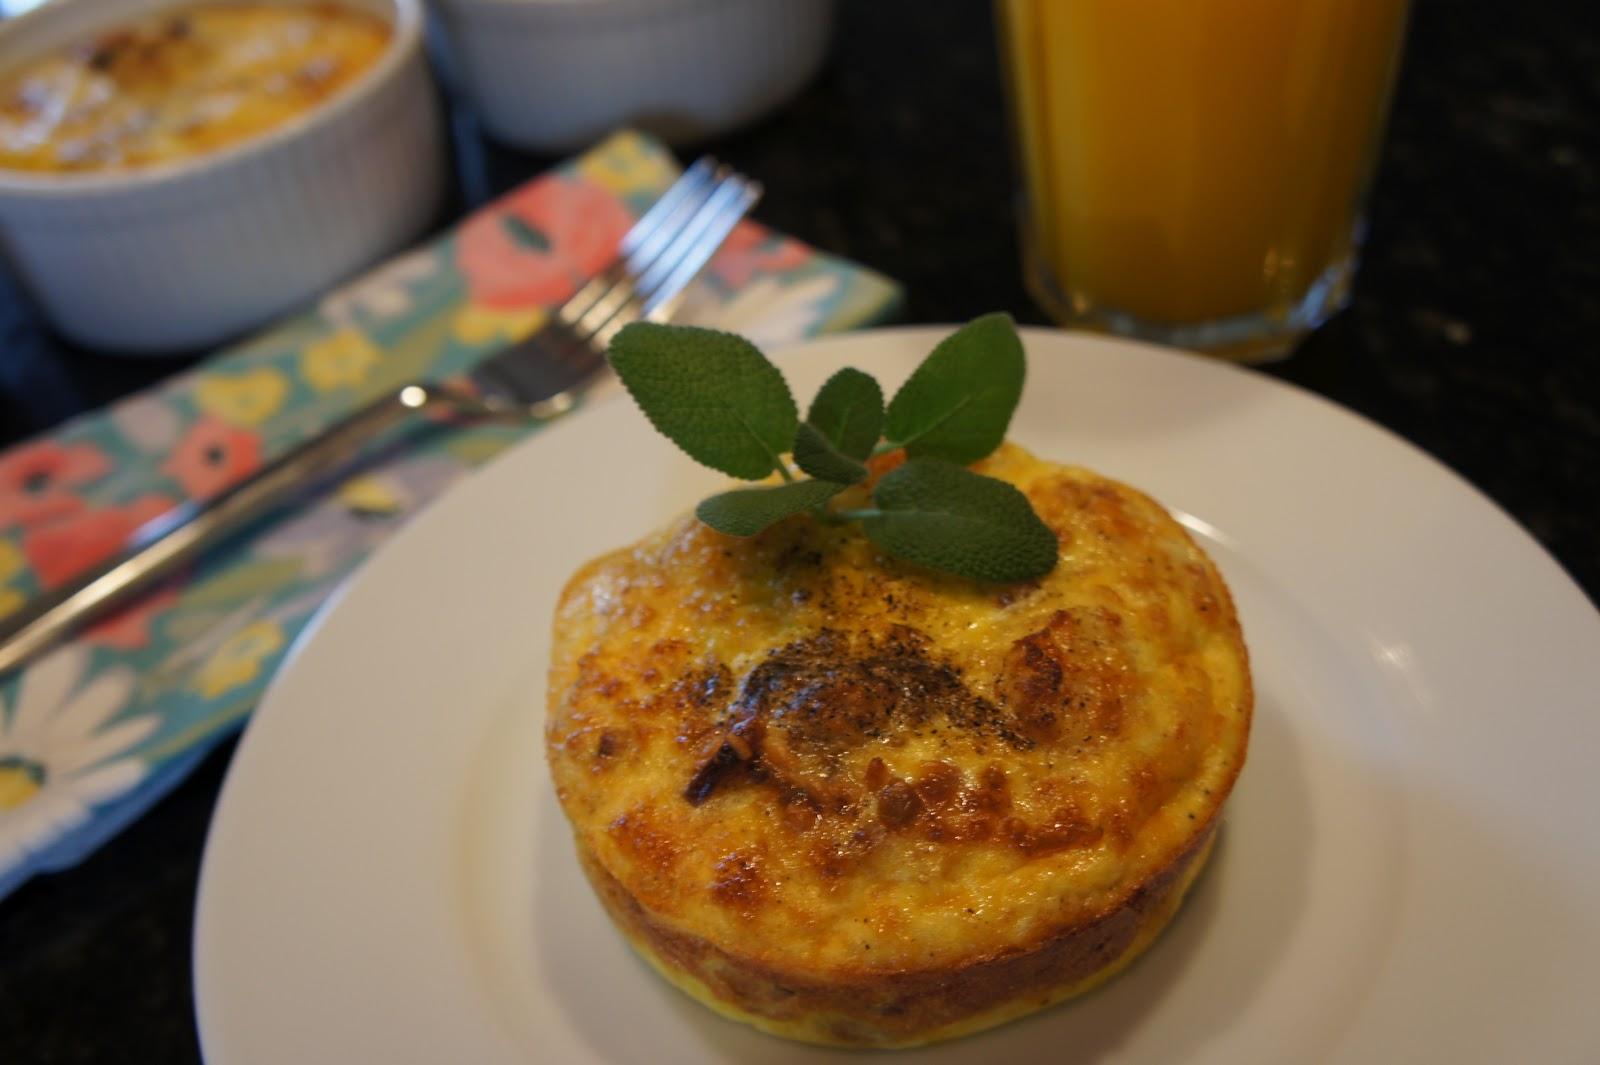 Simple Kitchen With Missy Maki mini tater tot breakfast casseroles | mrs. maki cooks~the simple